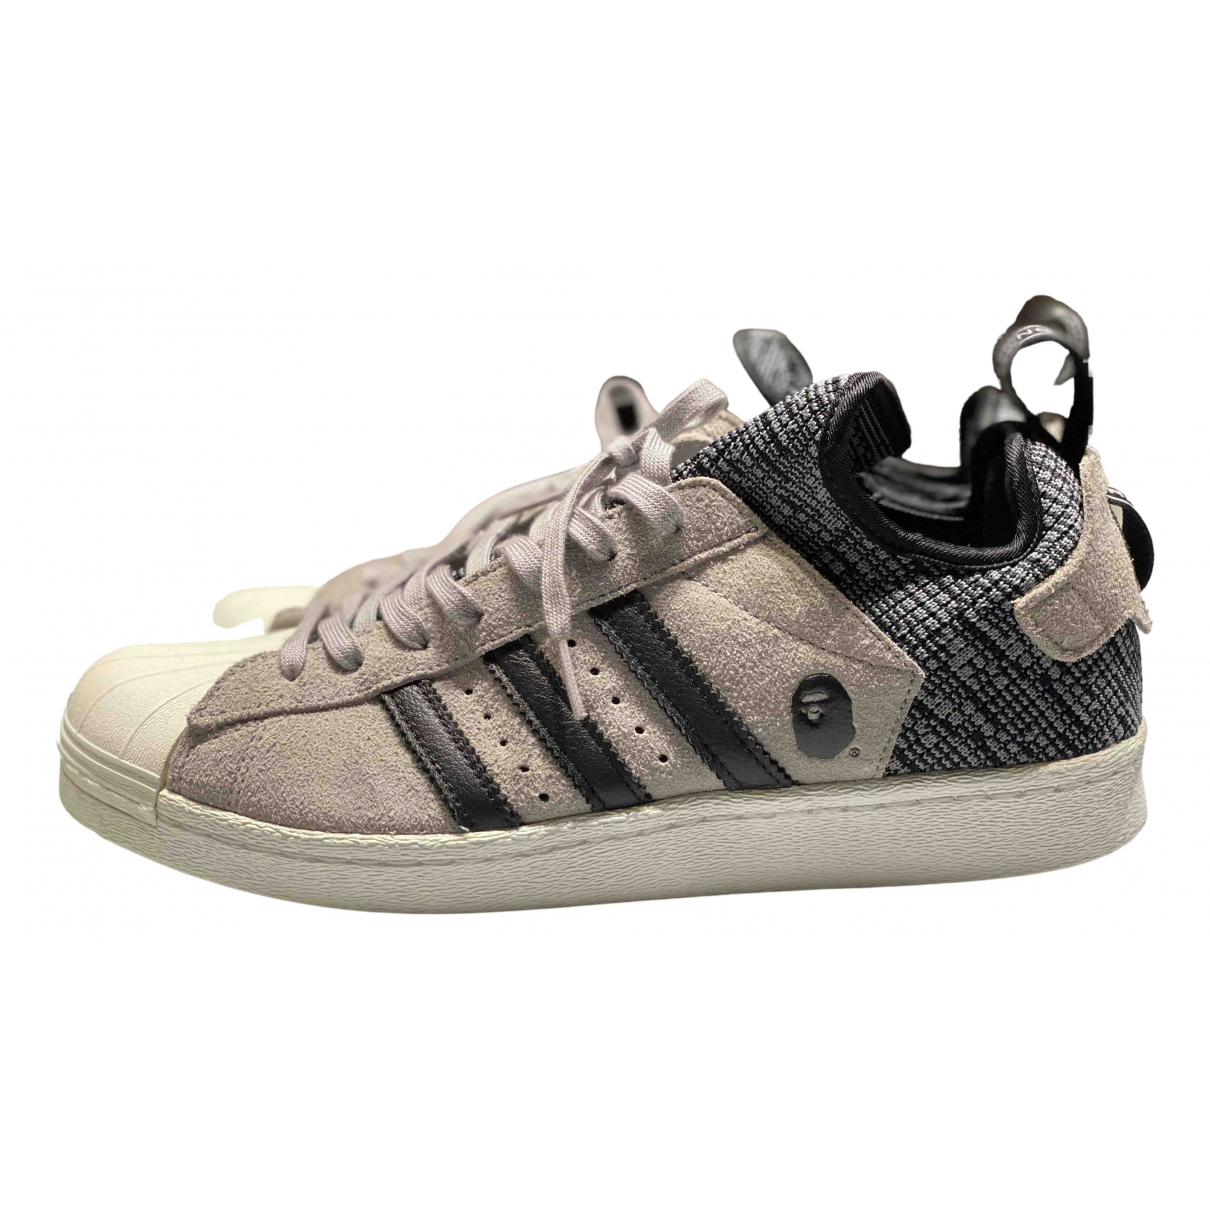 Adidas X A Bathing Ape \N Sneakers in Leinen